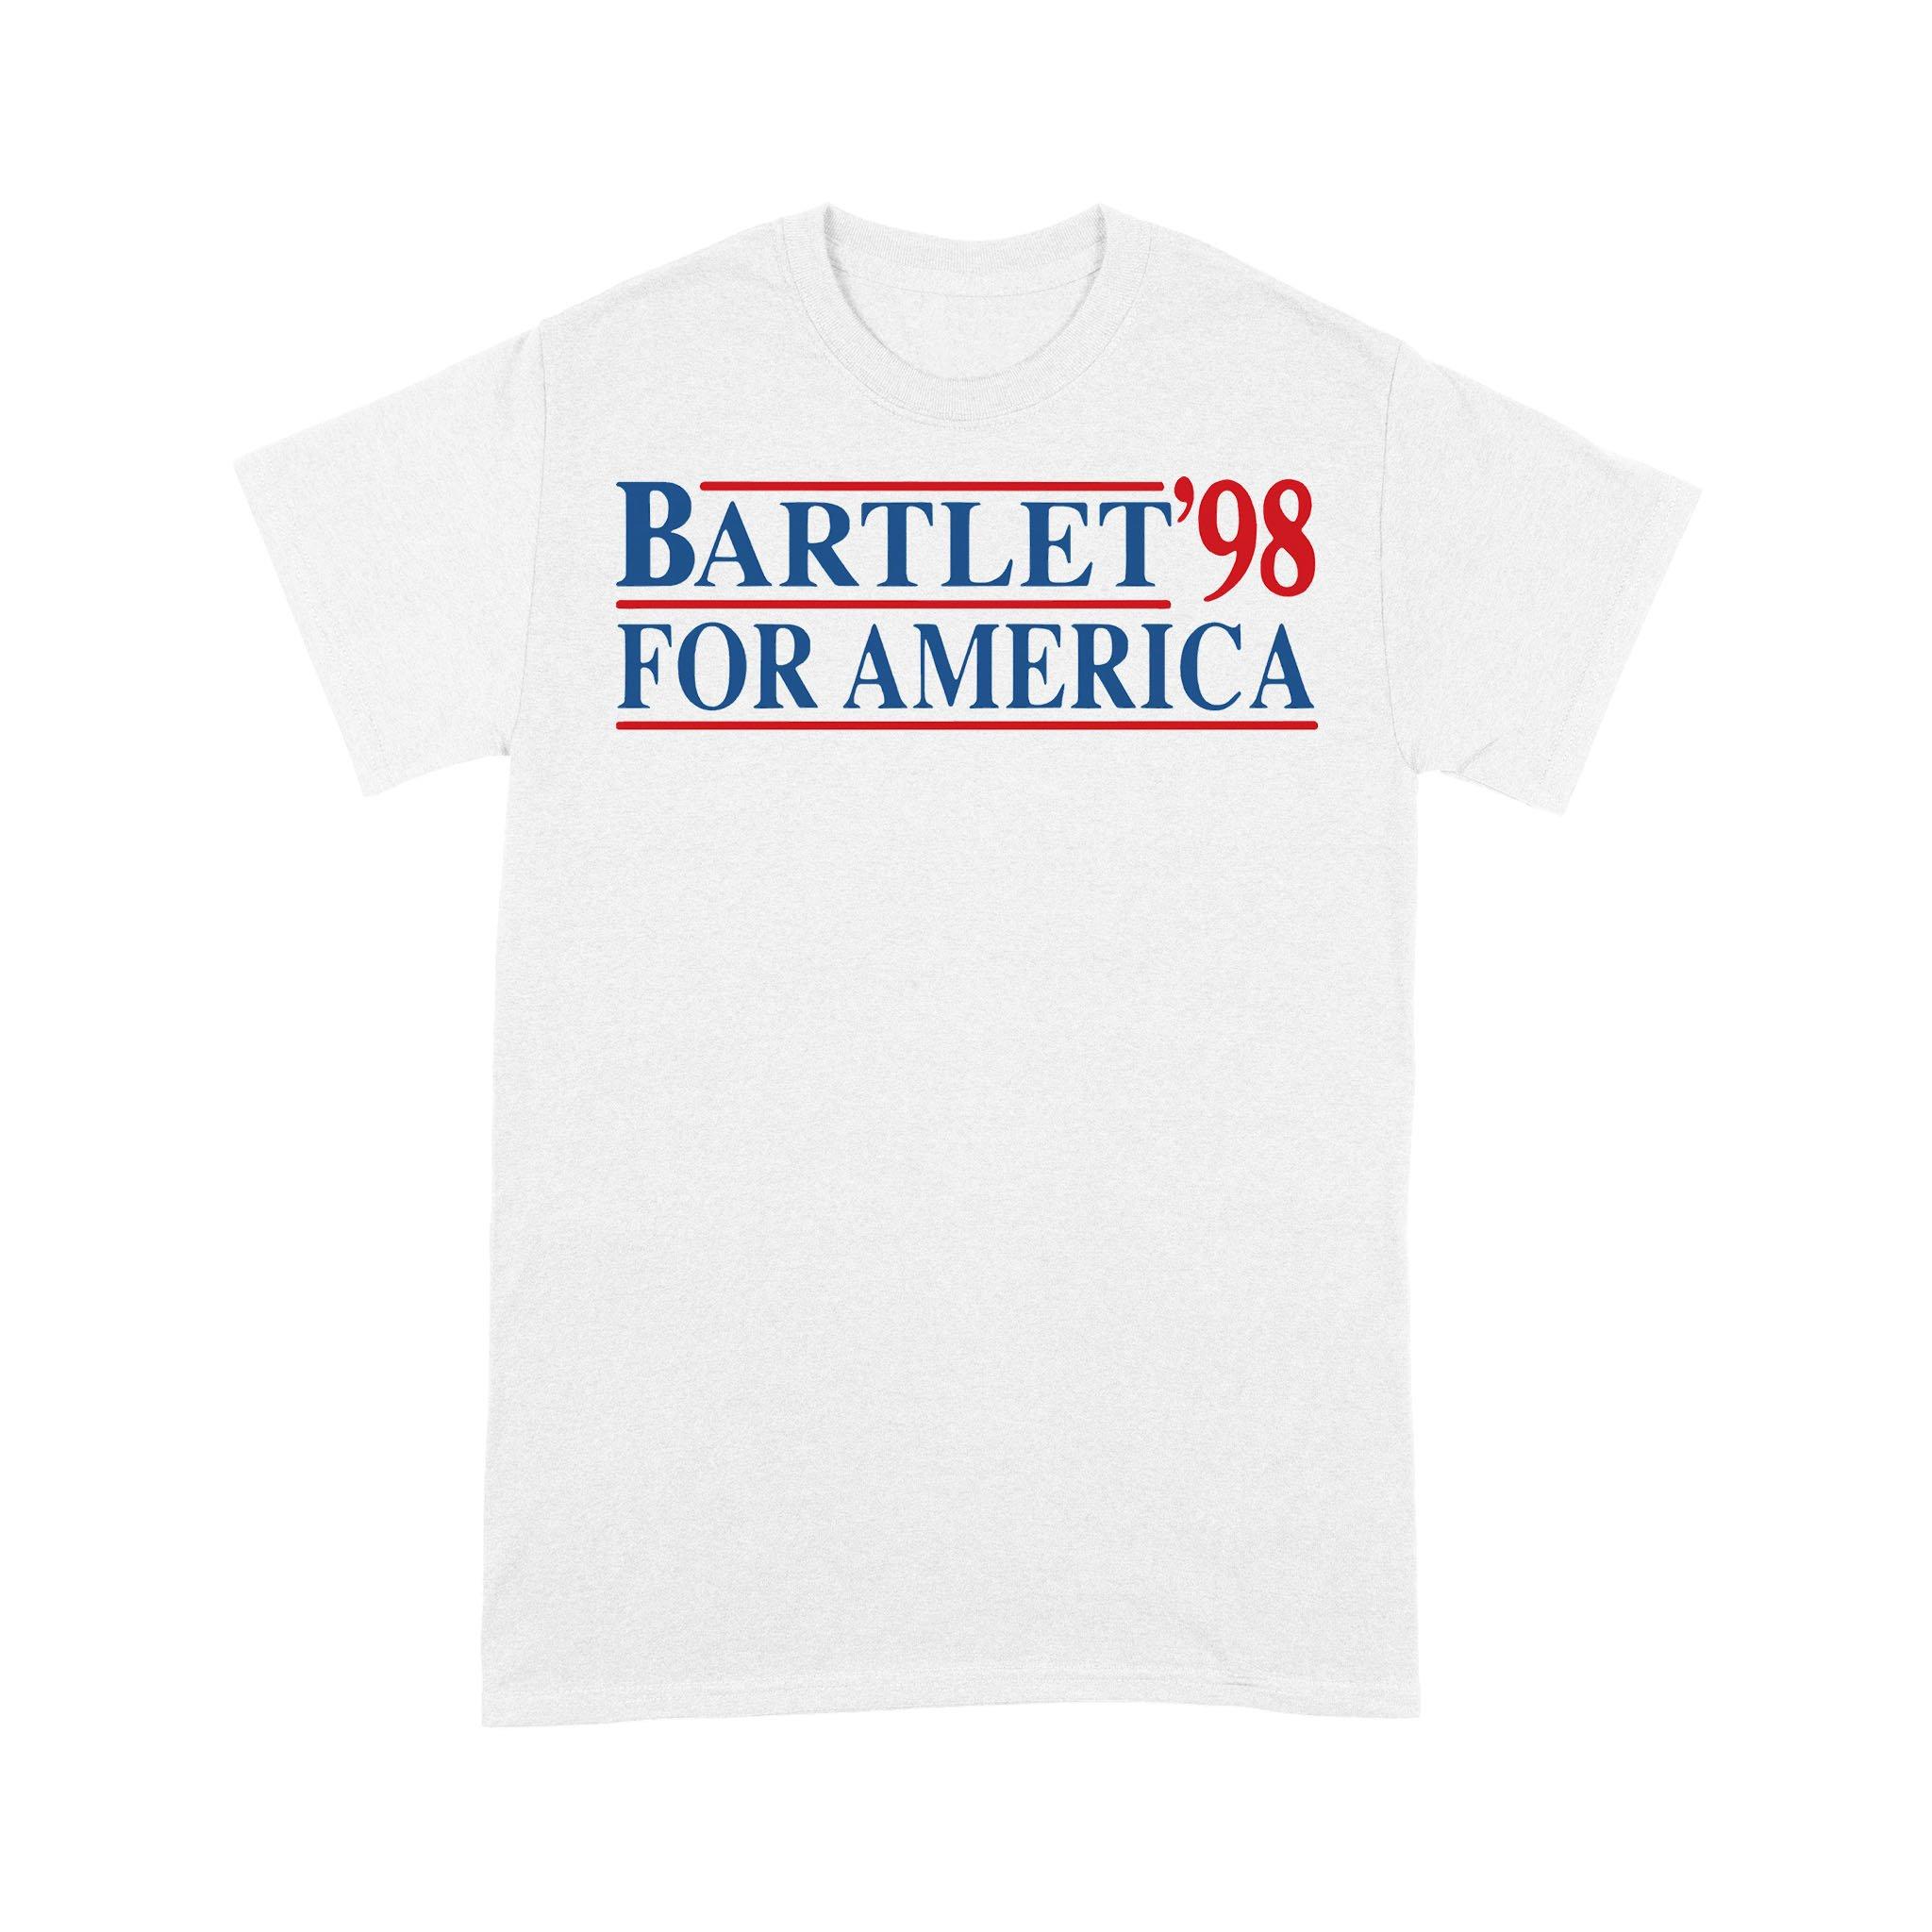 Bartlet '98 For America T-shirt